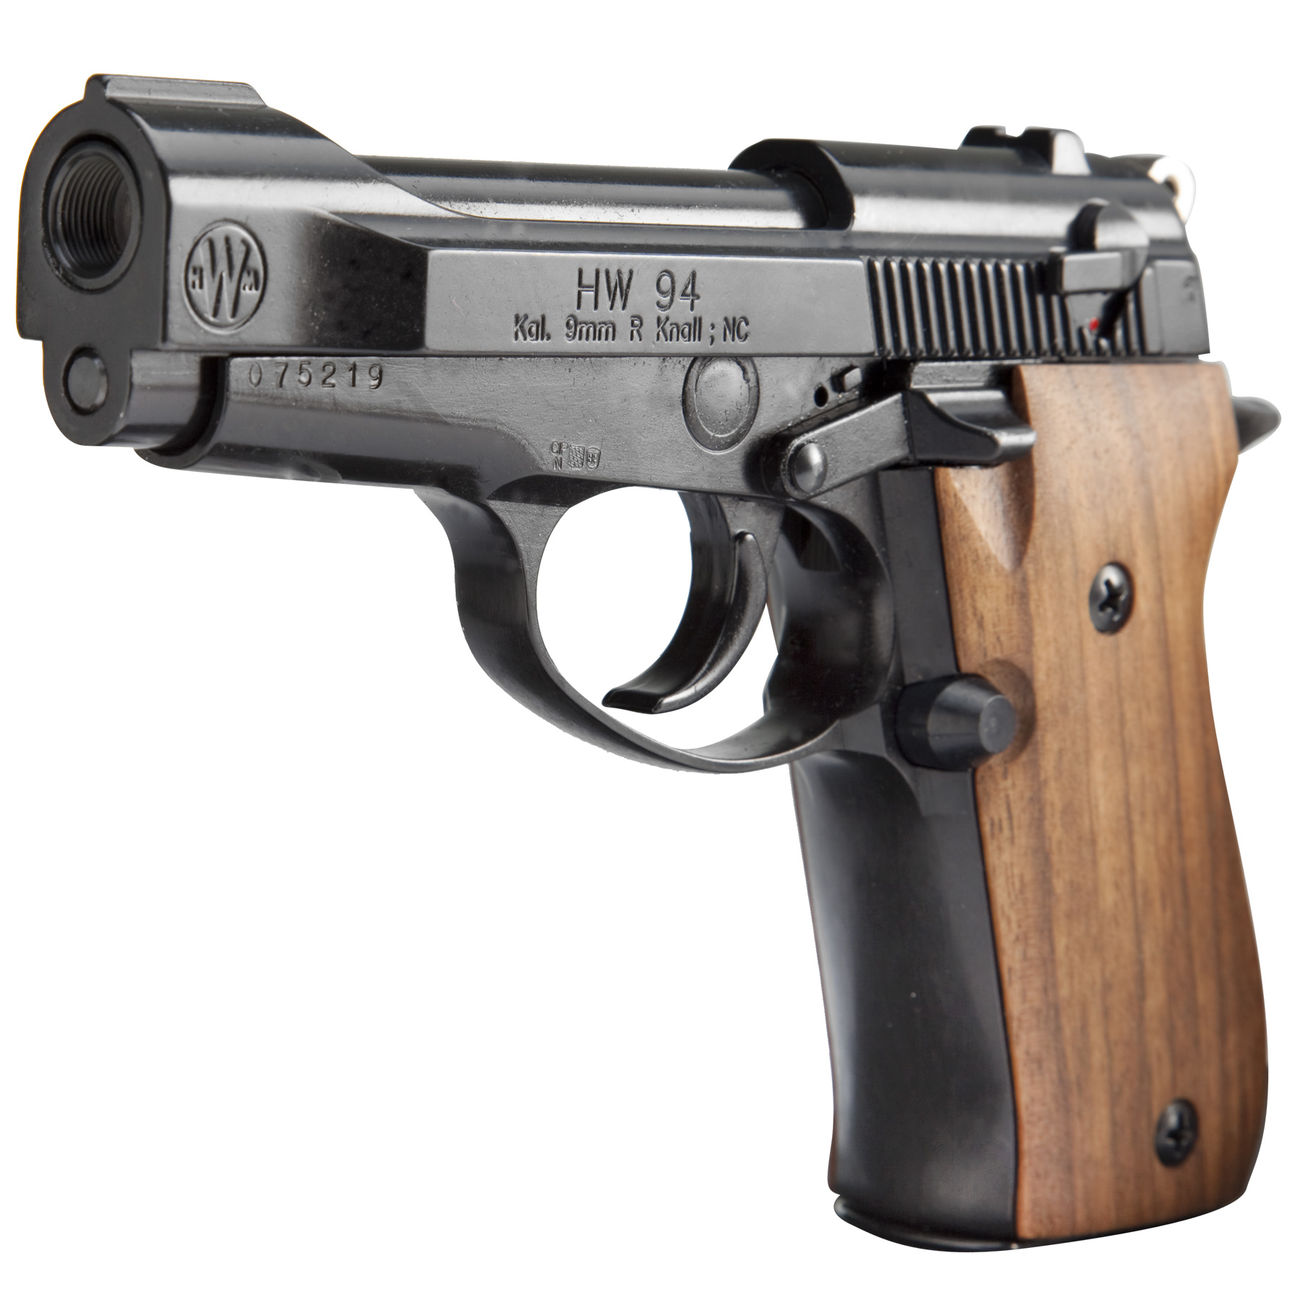 weihrauch hw 94 schreckschuss pistole 9mm r k br niert holzgriffschalen kotte zeller. Black Bedroom Furniture Sets. Home Design Ideas